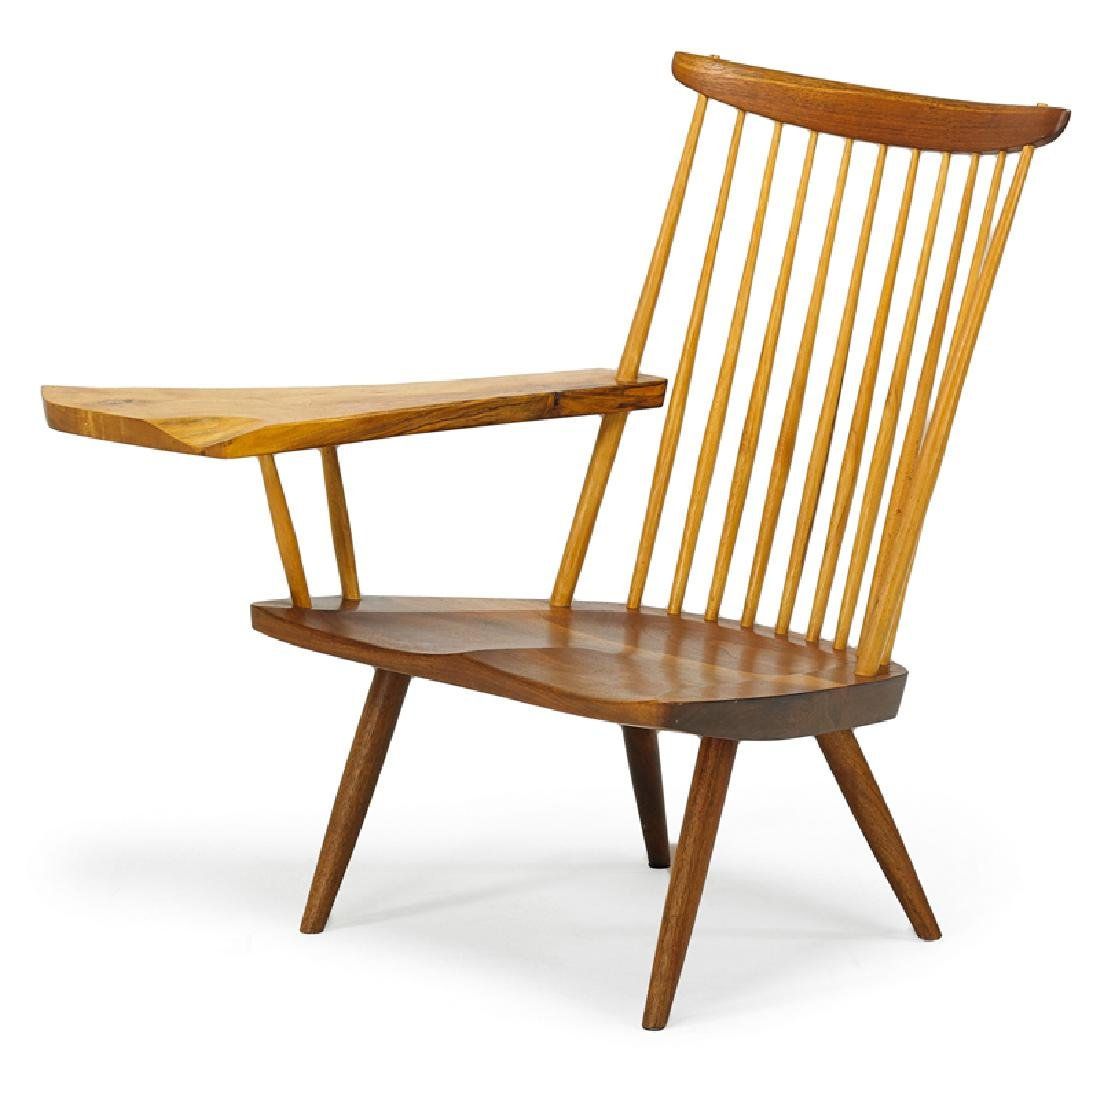 MIRA NAKASHIMA New Chair with Arm